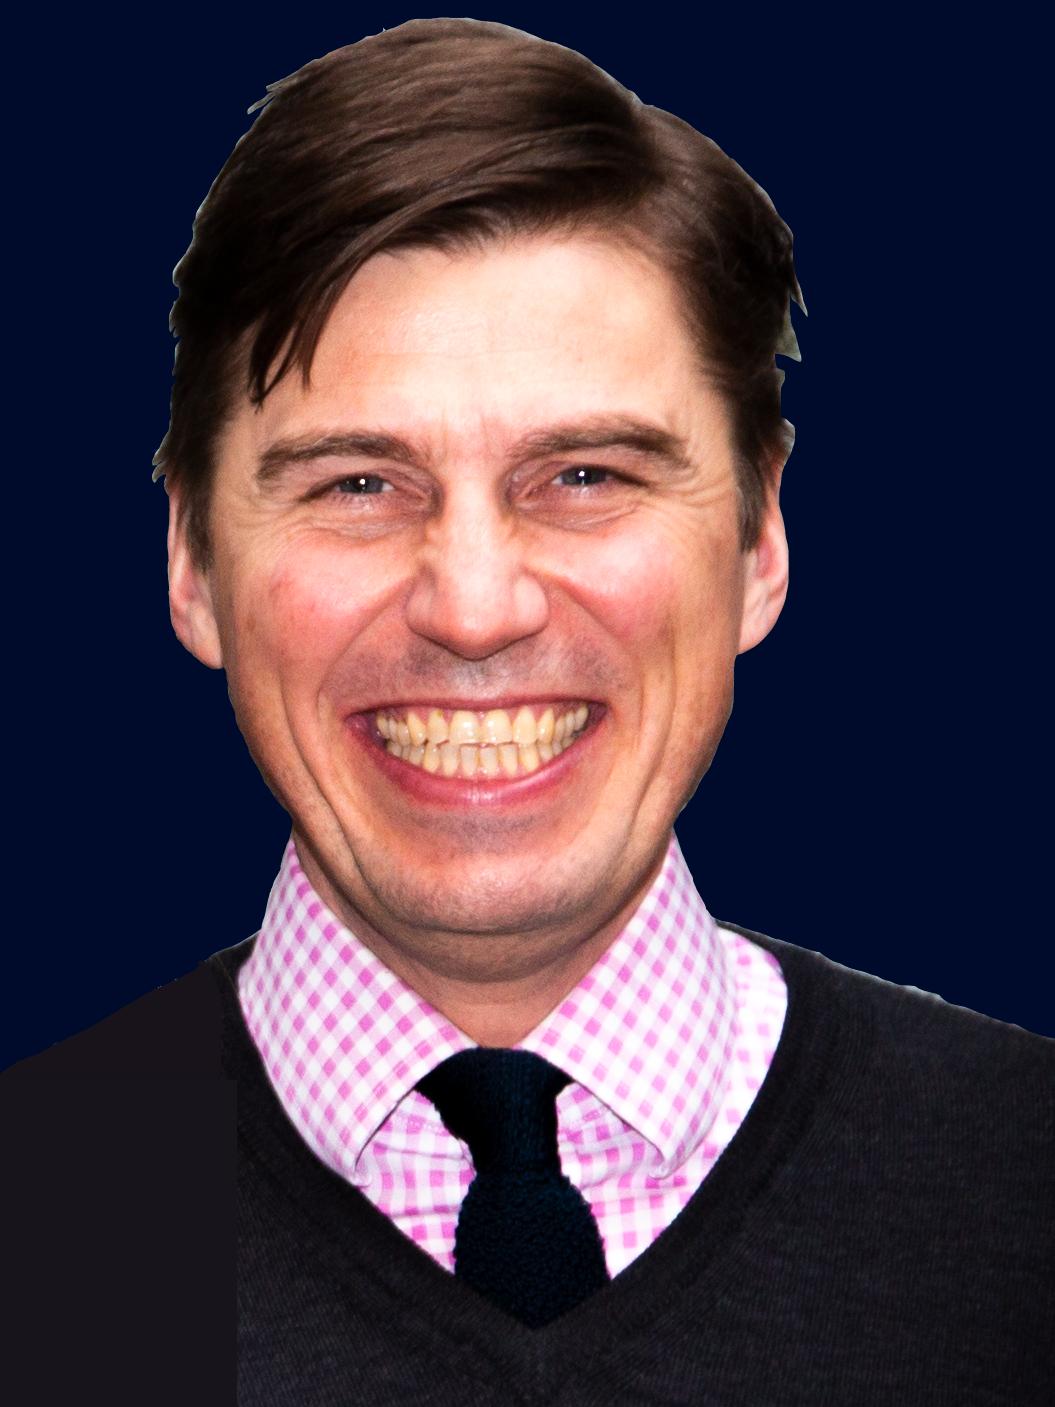 Erik Nordenskjöld